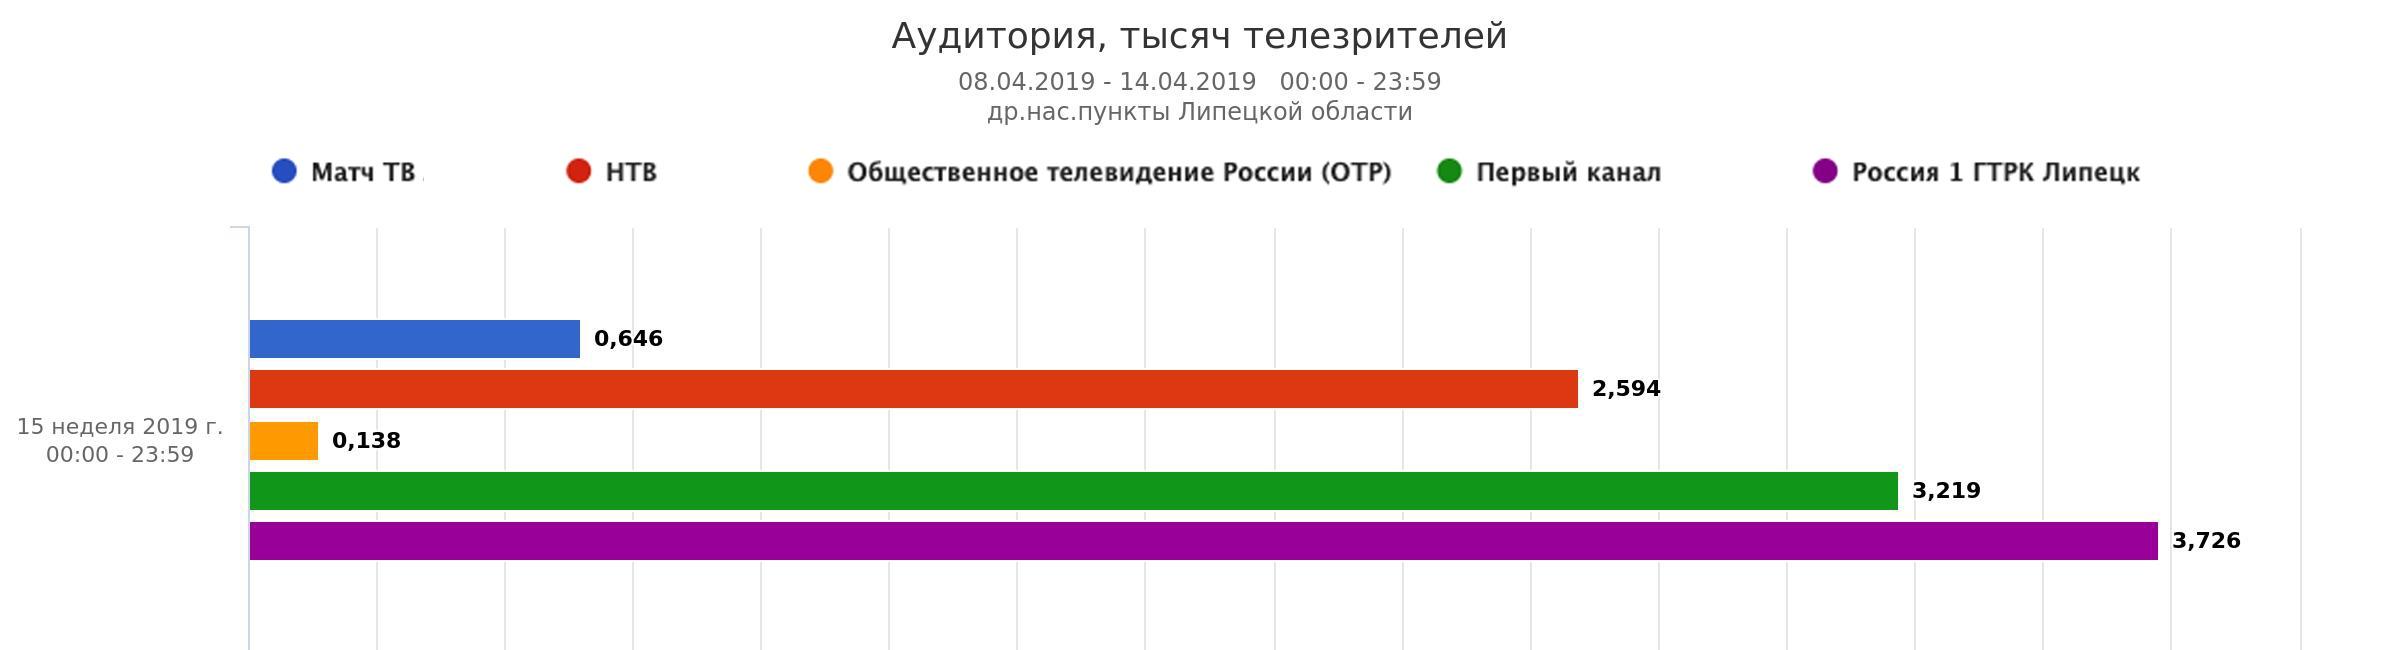 «Россия 1» снова лидер телепроката в Липецкой области — Изображение 2